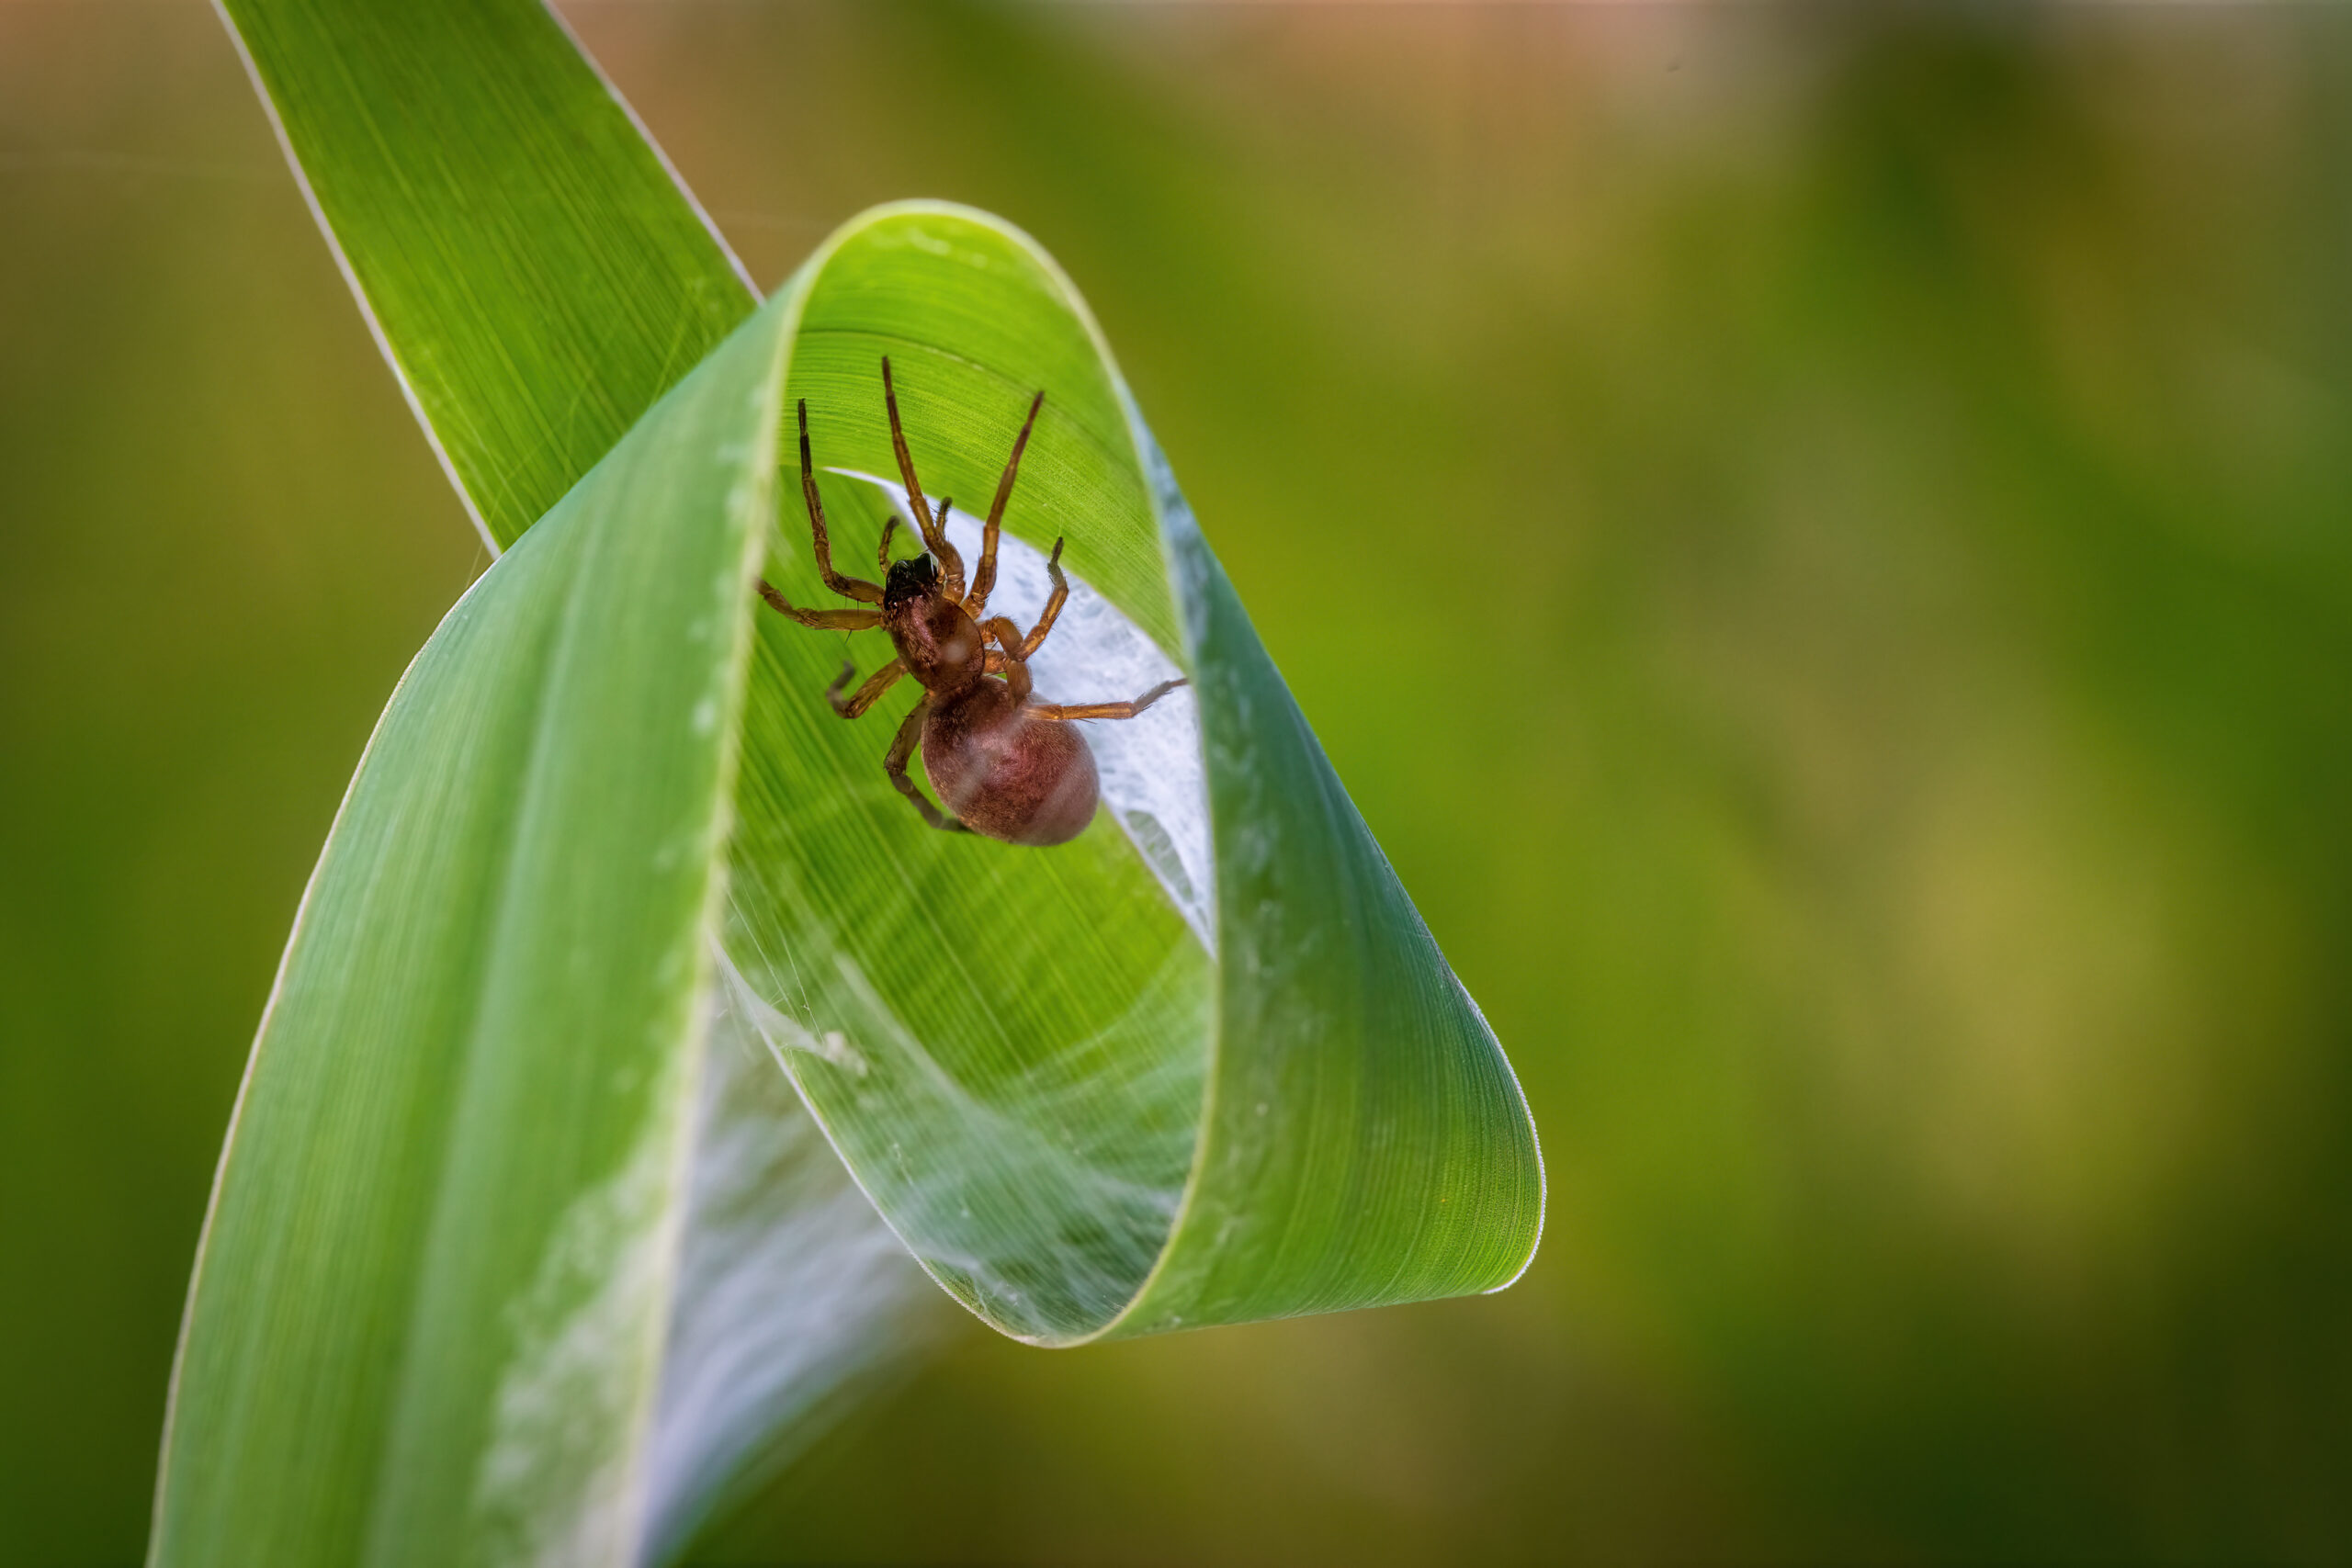 Spinne im Blattkringel